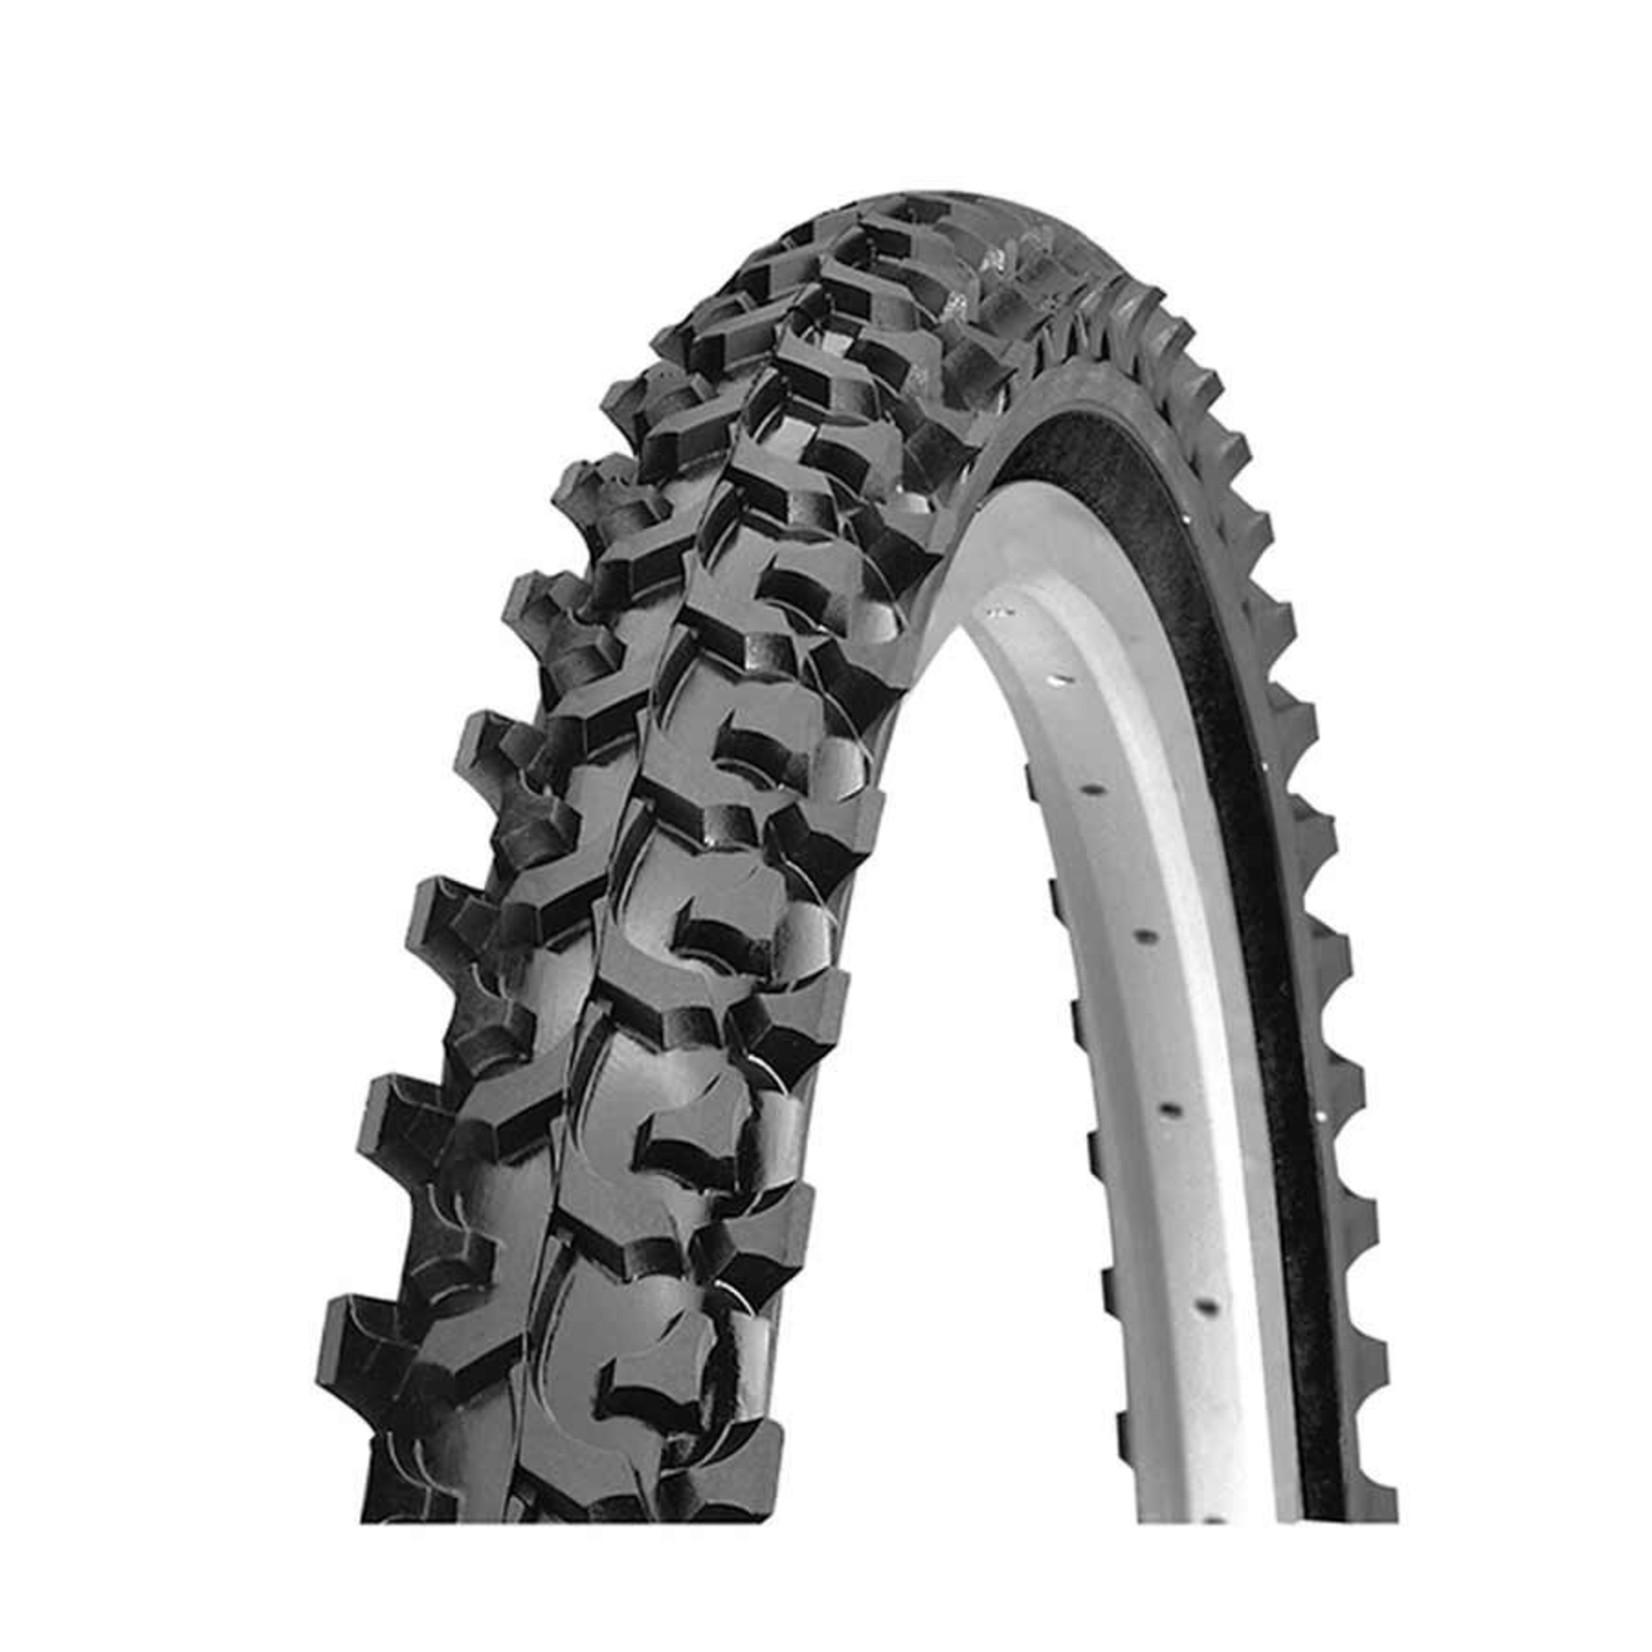 Kenda K850 26x2.1 Wire Bead Tire